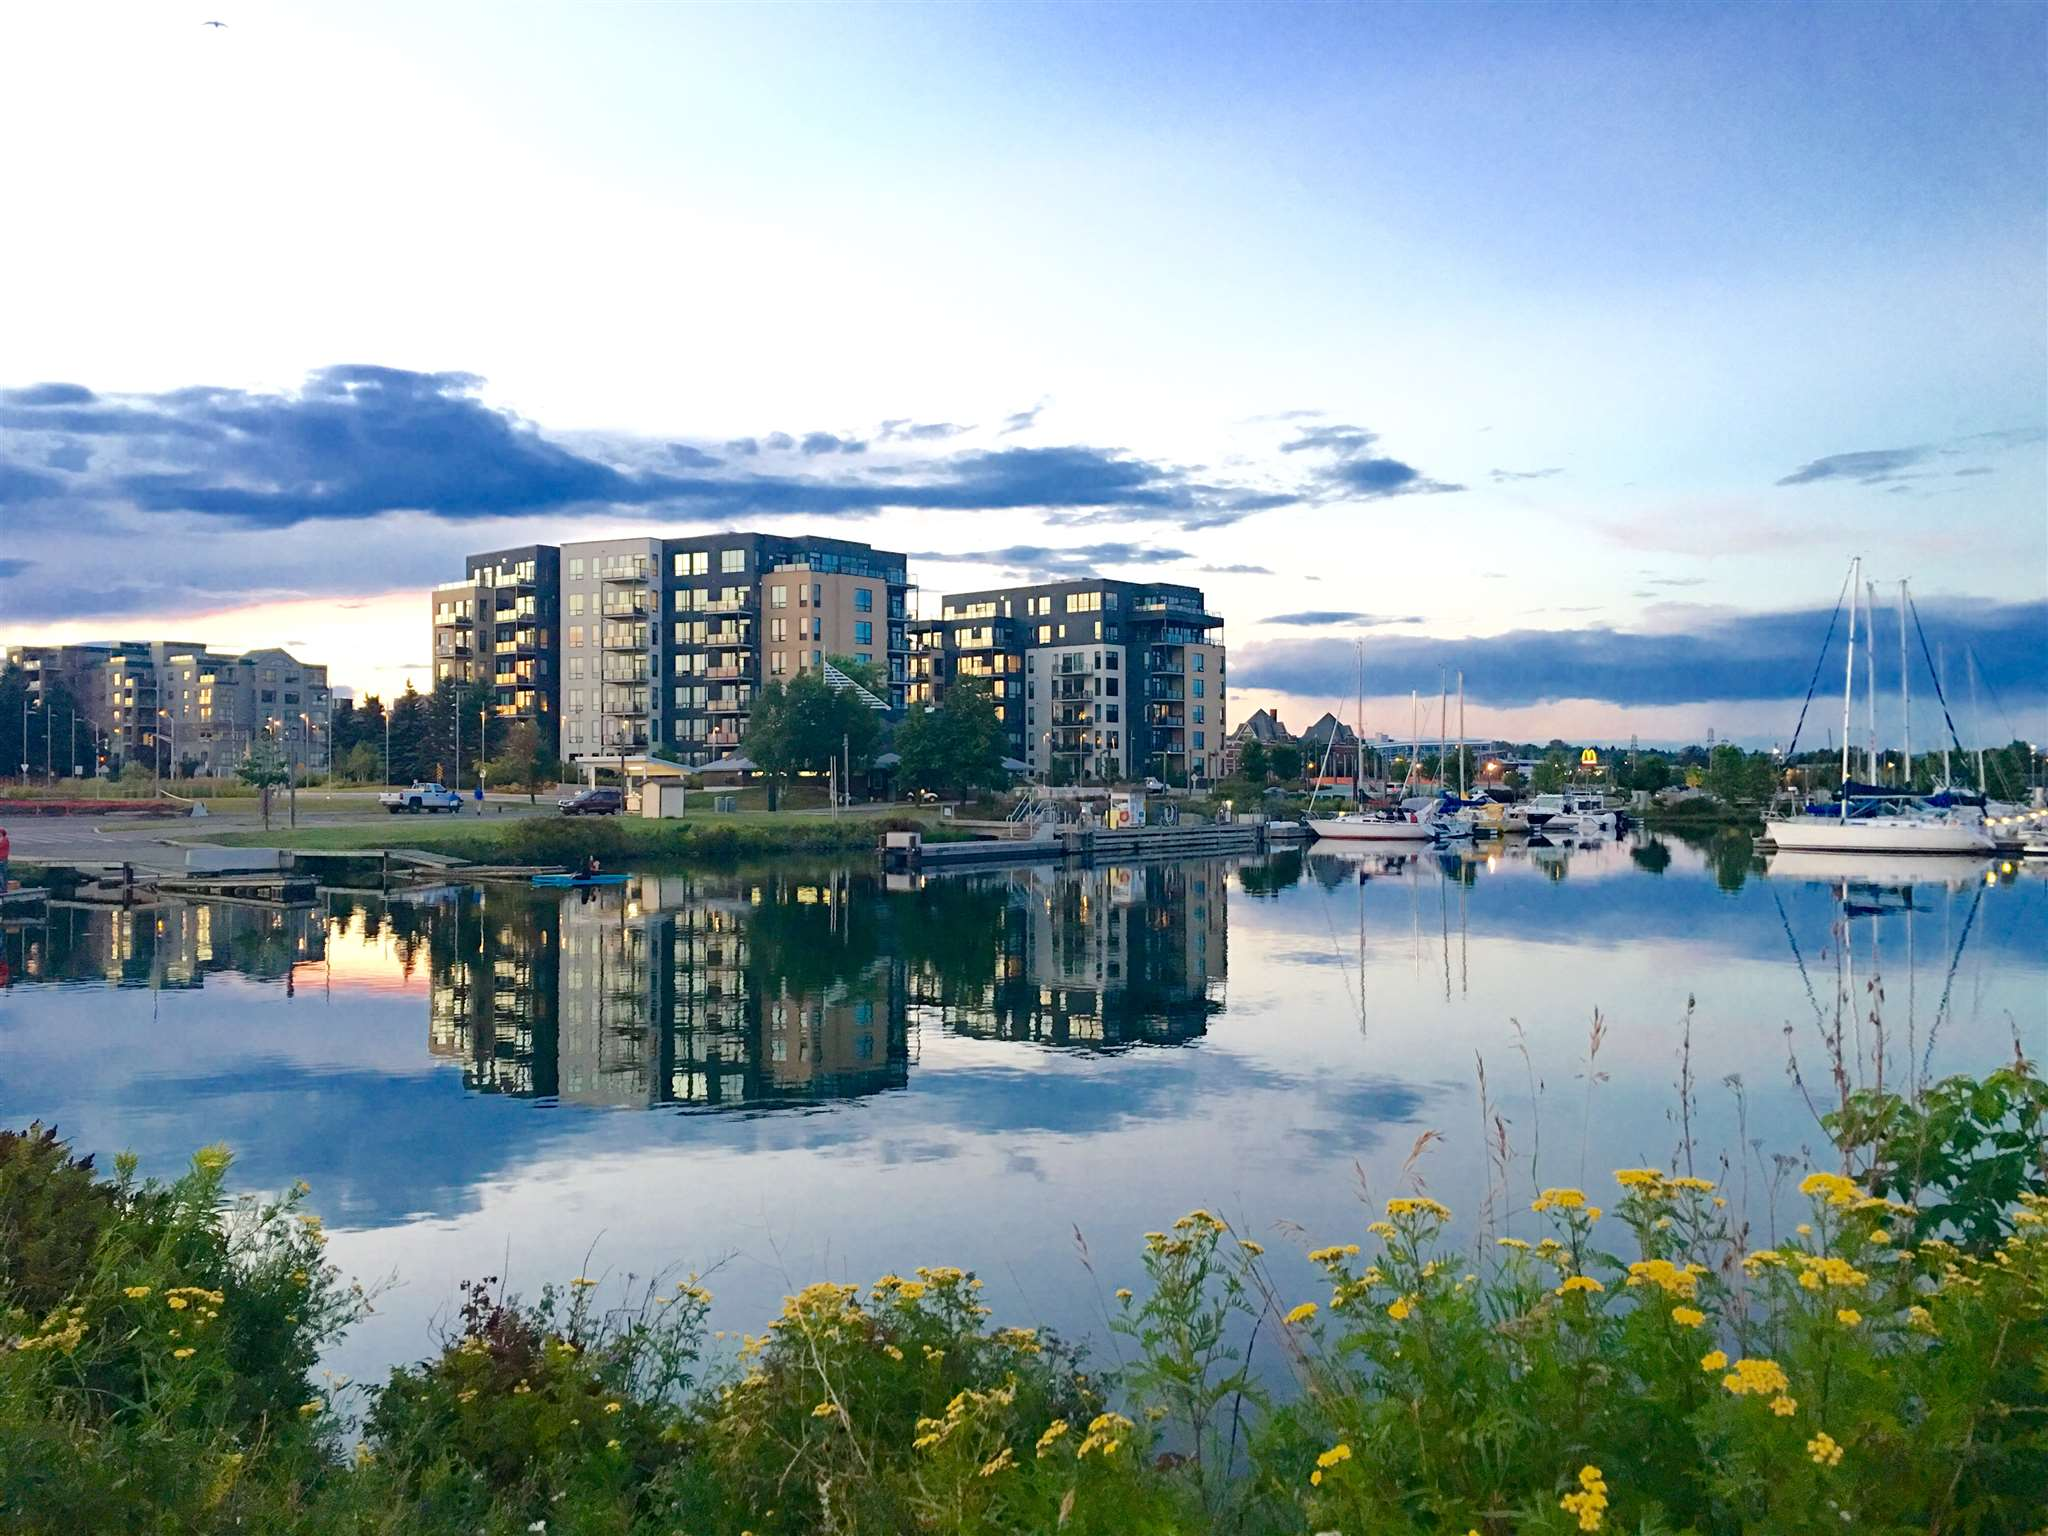 1102 2280 Sleeping Giant Parkway, Thunder Bay Ontario, Canada